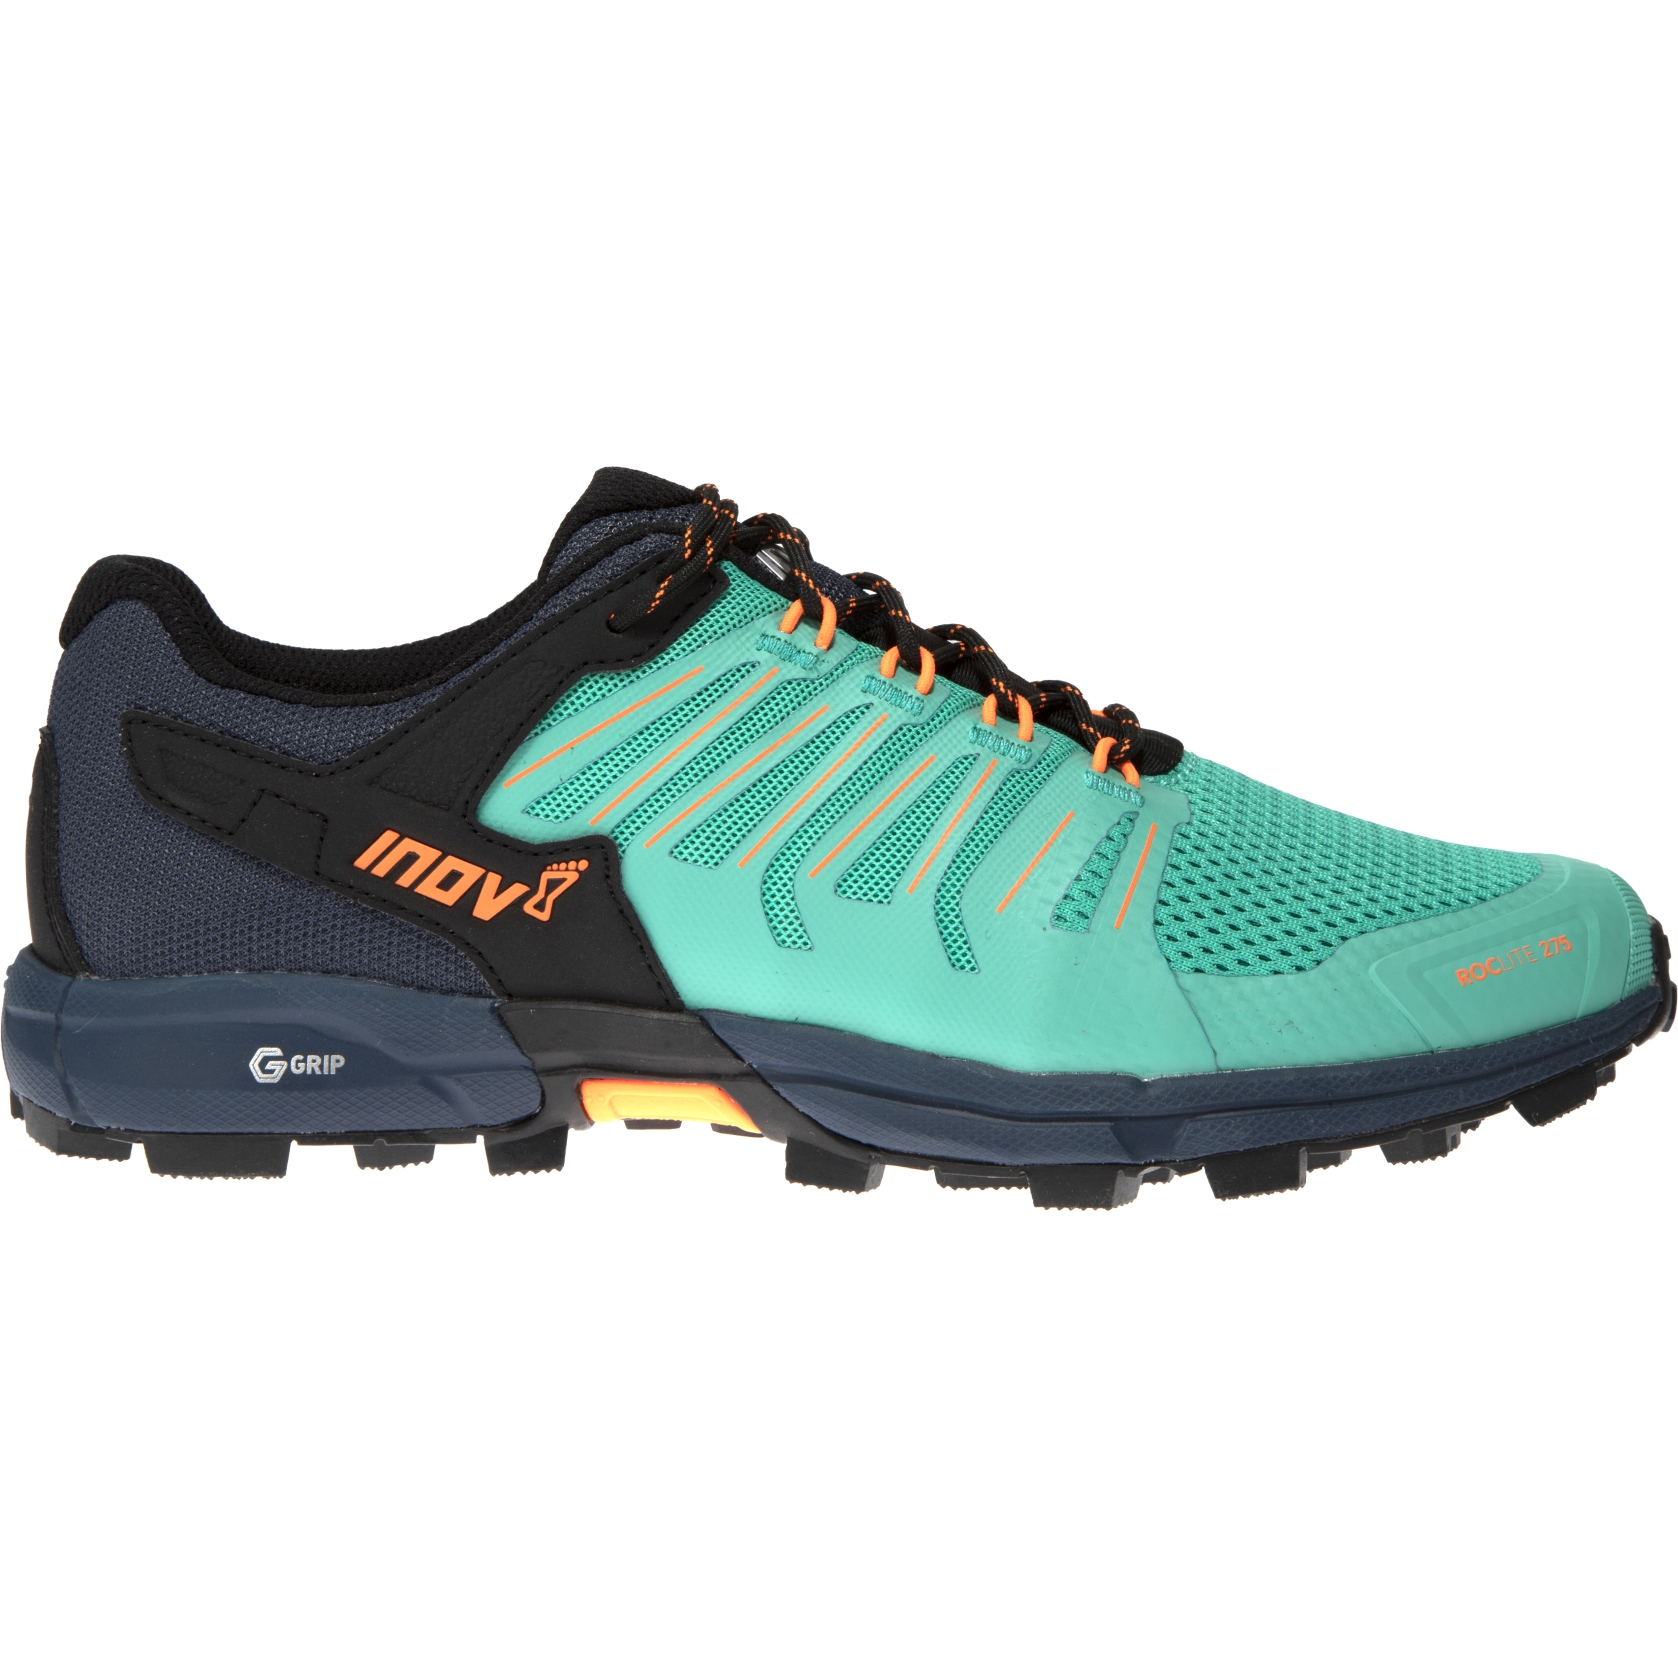 Image of Inov-8 Roclite G 275 Women's Running Shoe - teal/navy